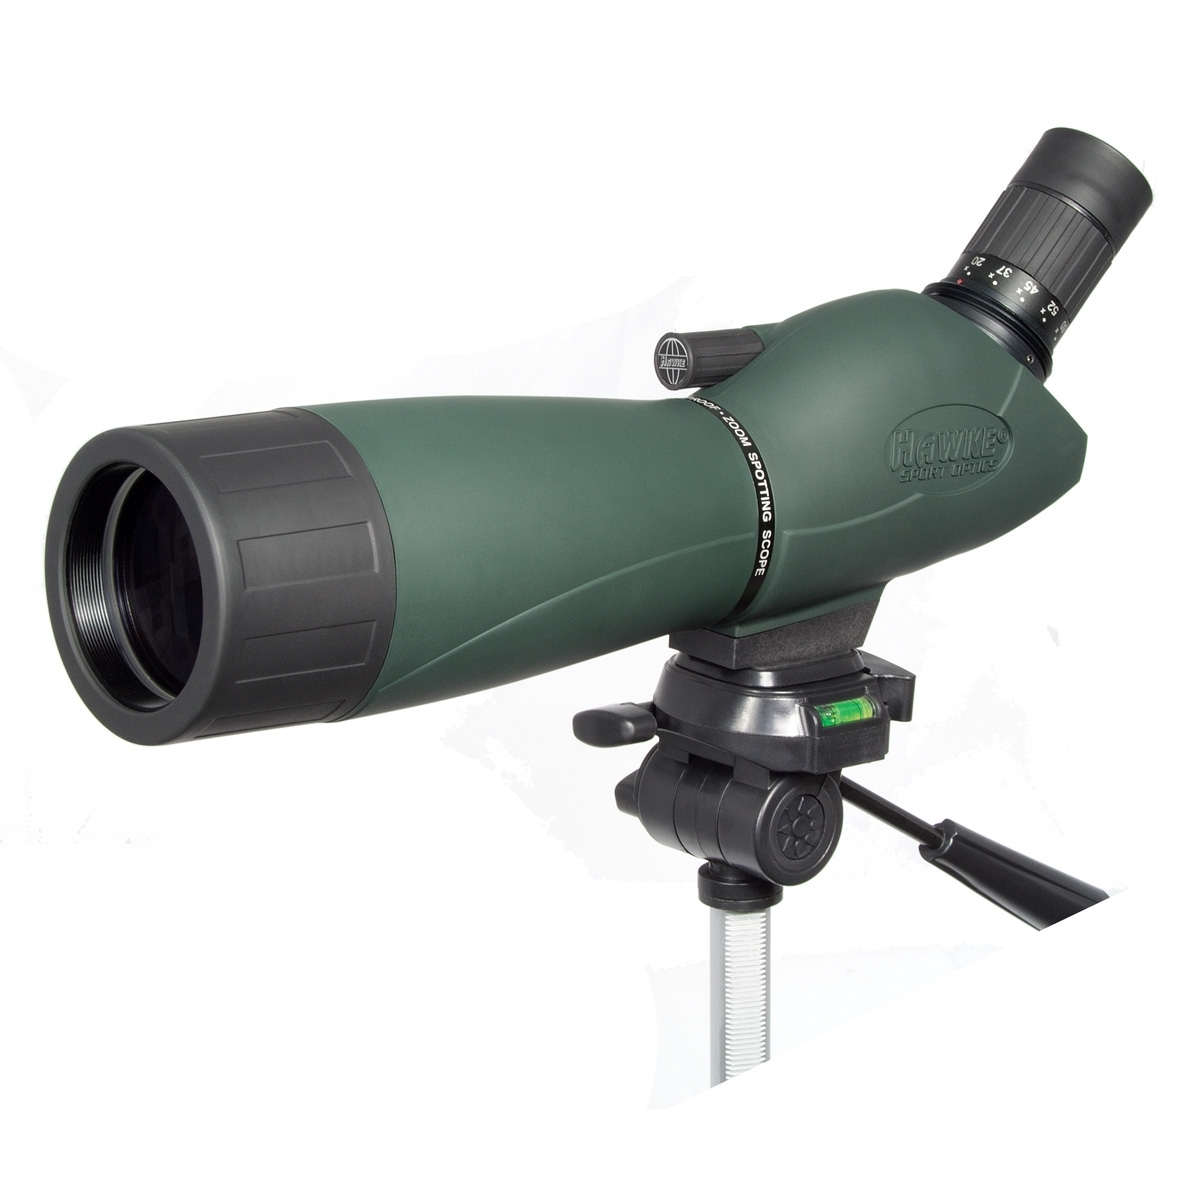 Image Of Hawke Vantage 20 60x60 Angled Spotting Scope